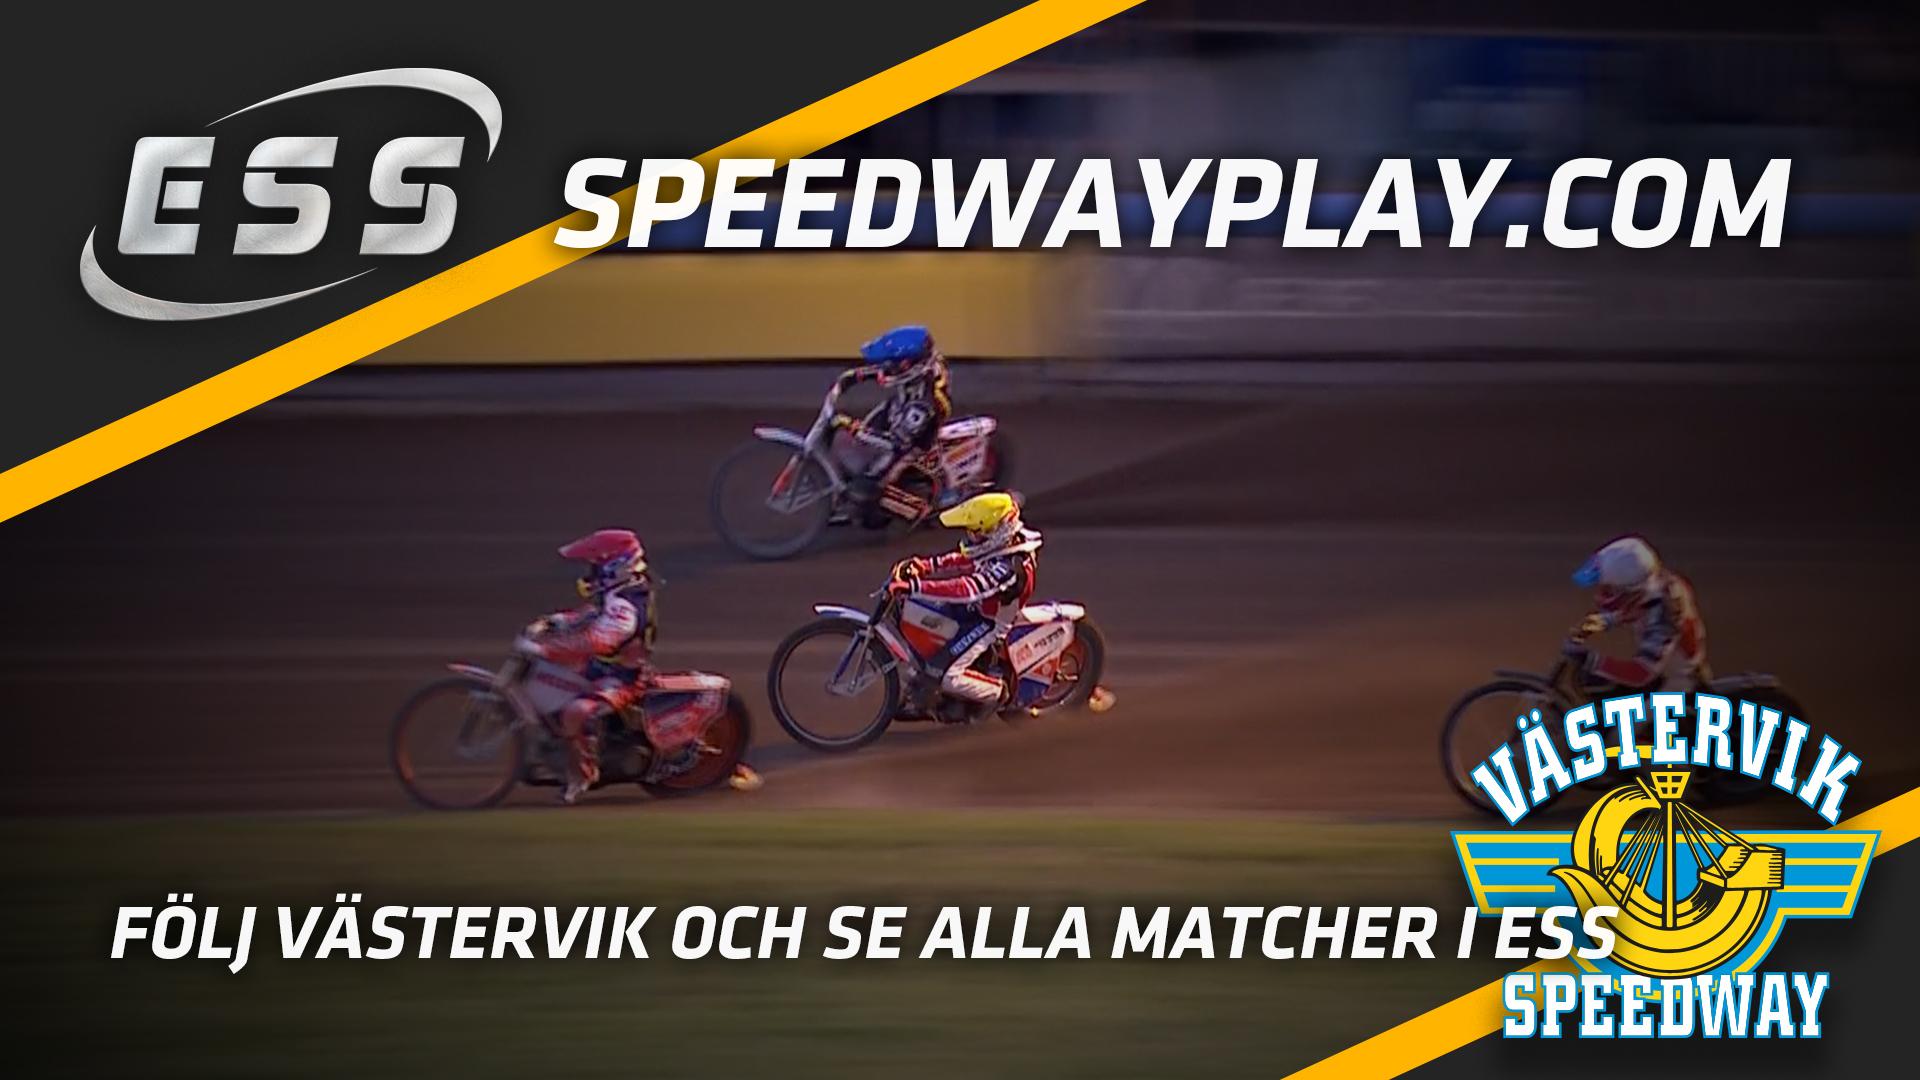 ESS speedwayplay.com